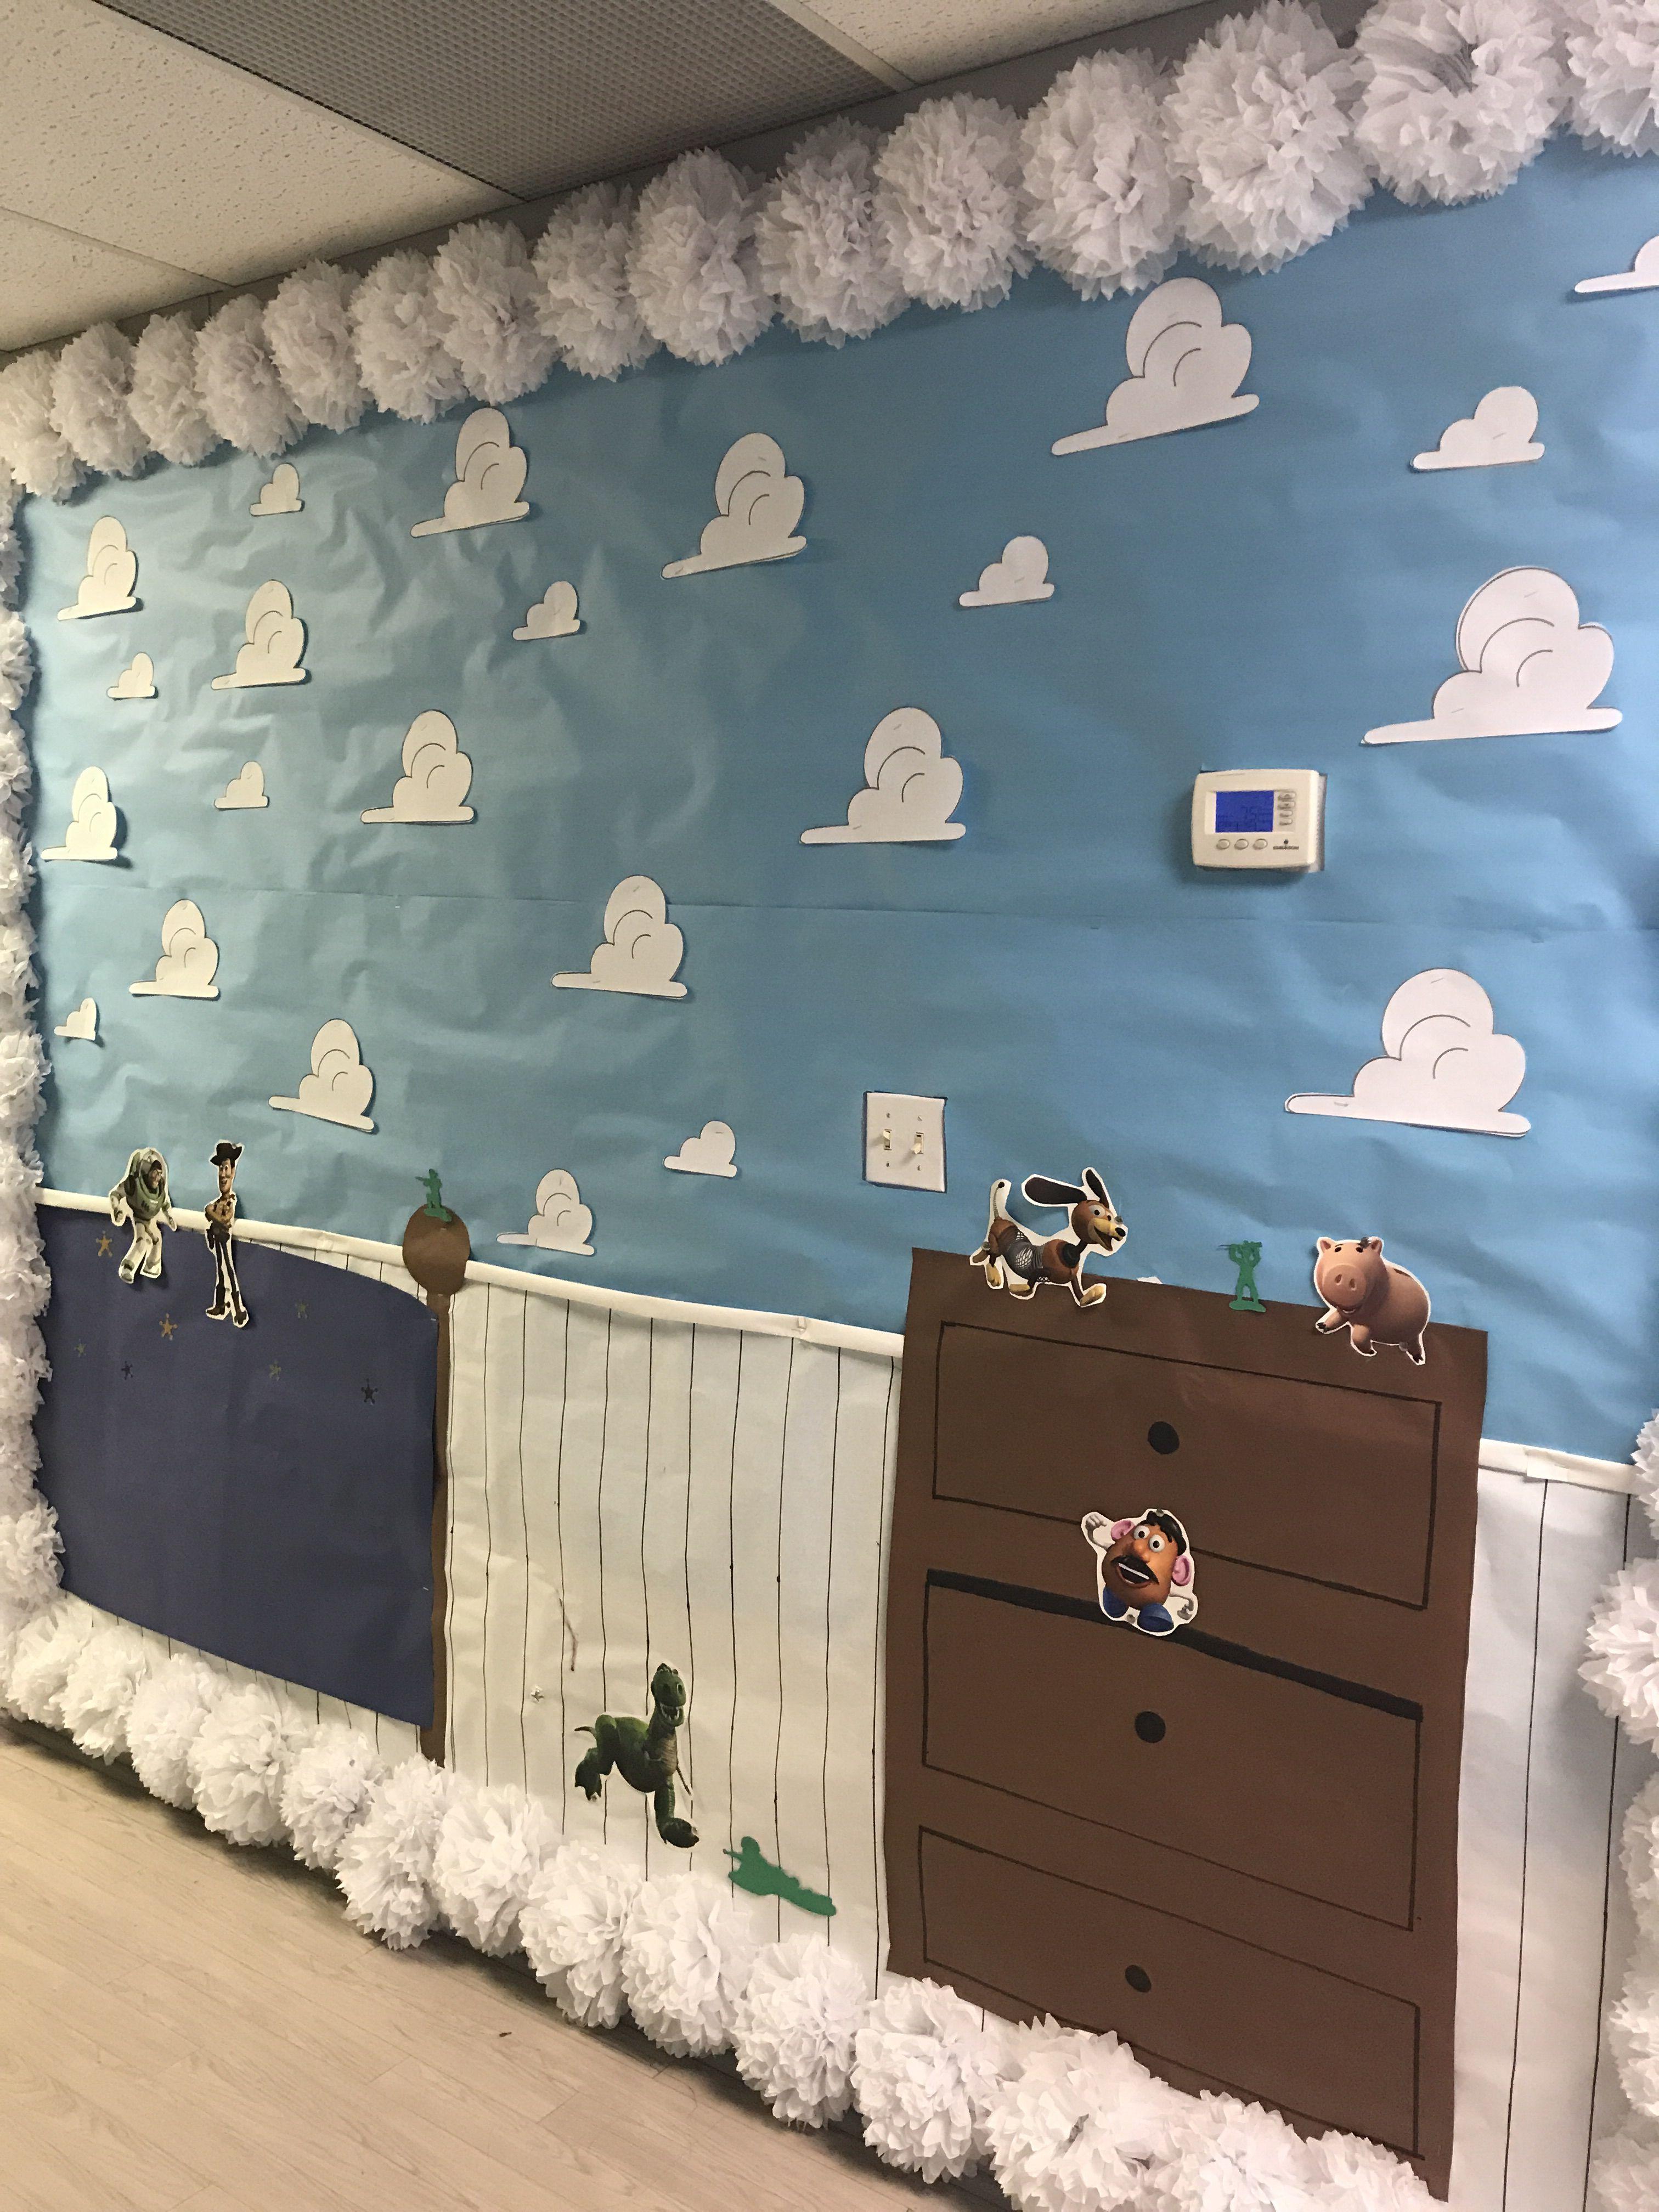 Andy S Room Crit Education Hallway Disney Decor Bedroom